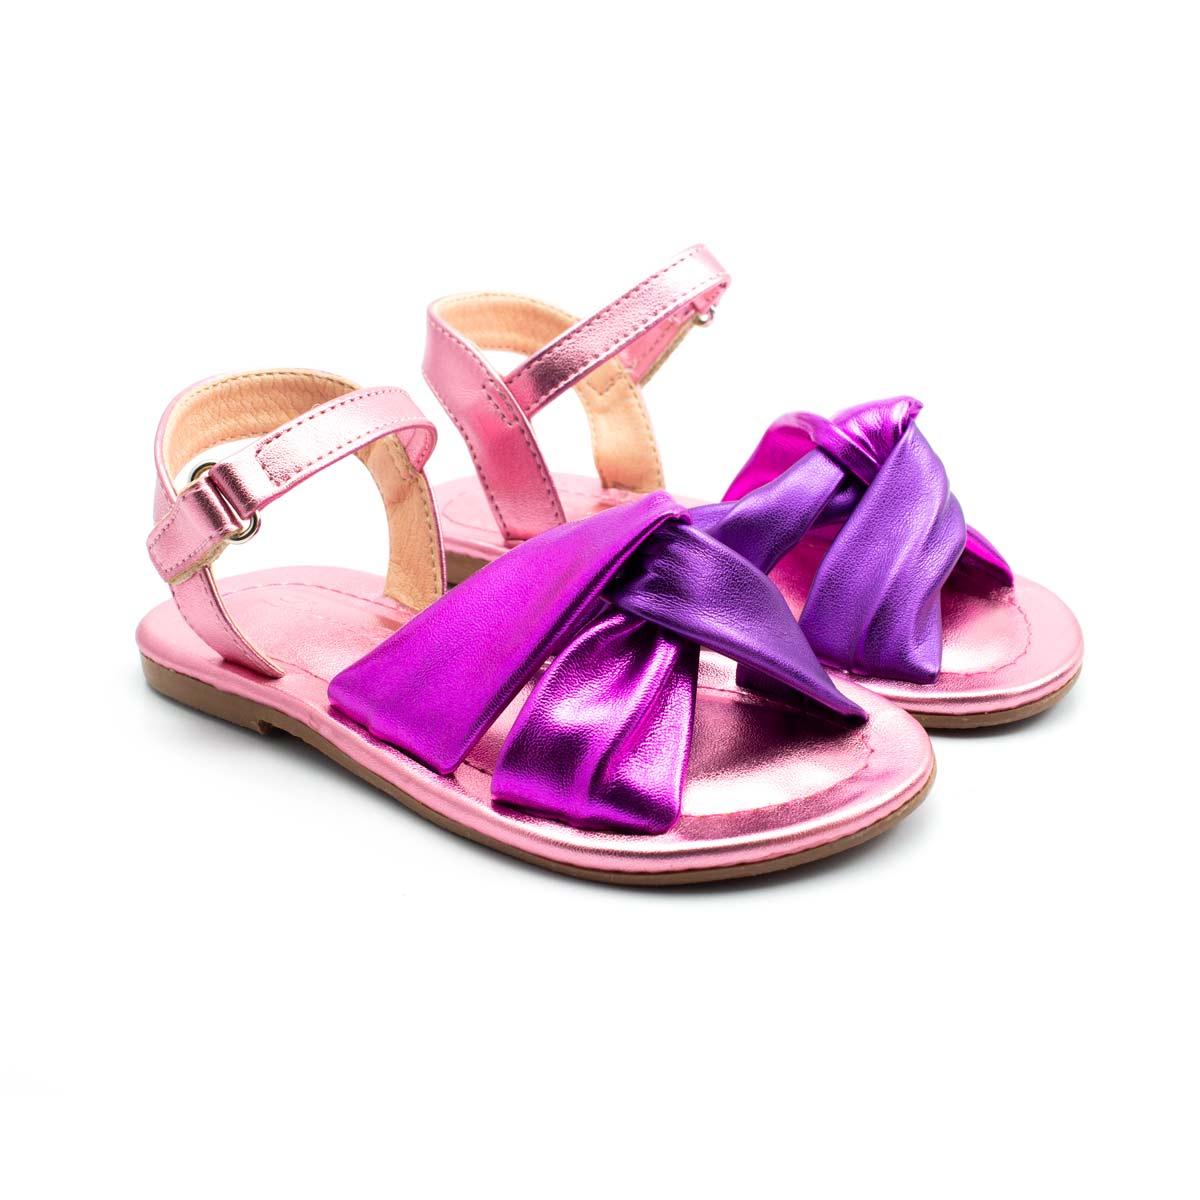 Sandalia-Flat-Baby-Menina-Tiras-Twist-Ludique-et-Badin--21-ao-27--977BL-11912B--VER21-